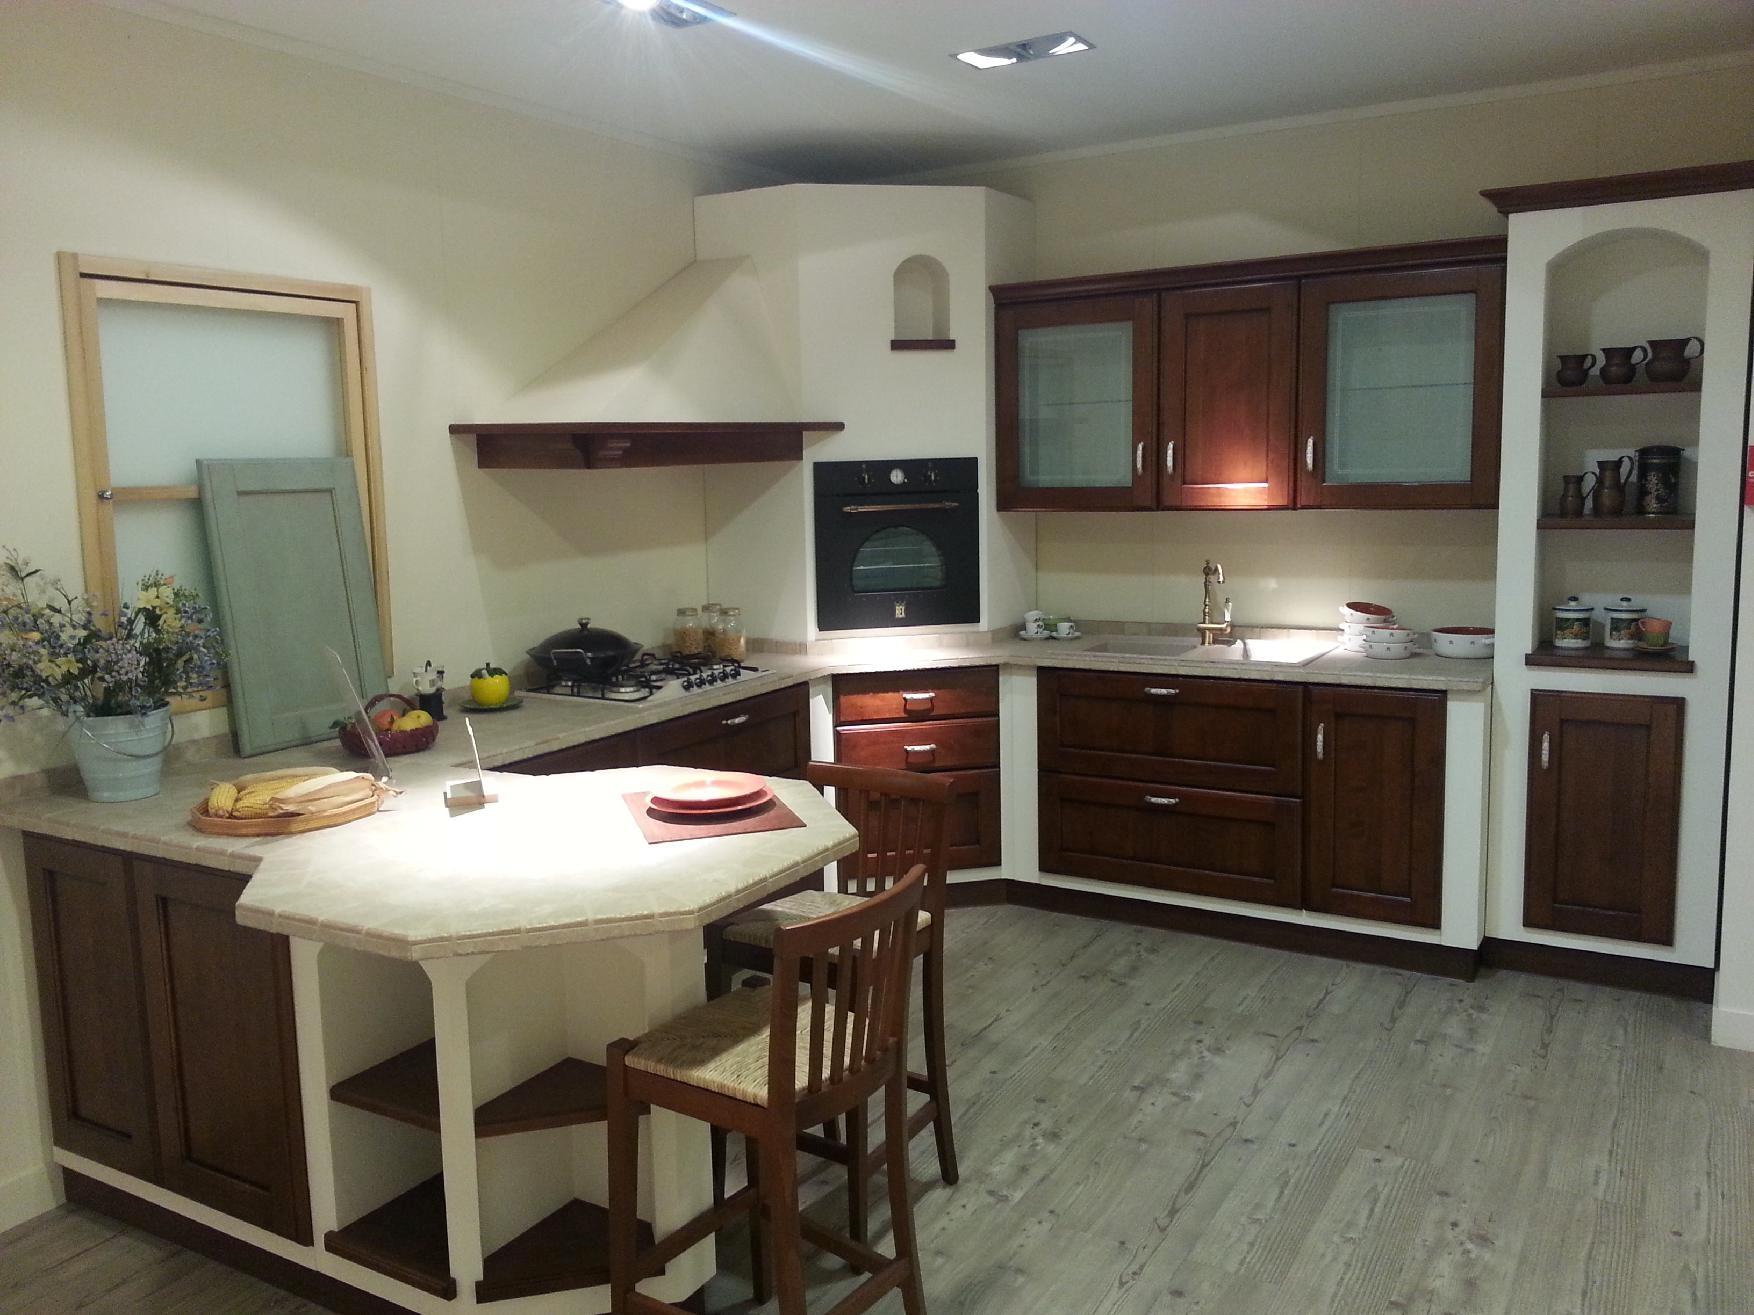 Offerta scavolini cora legno 20334 cucine a prezzi scontati - Cucine originali ...